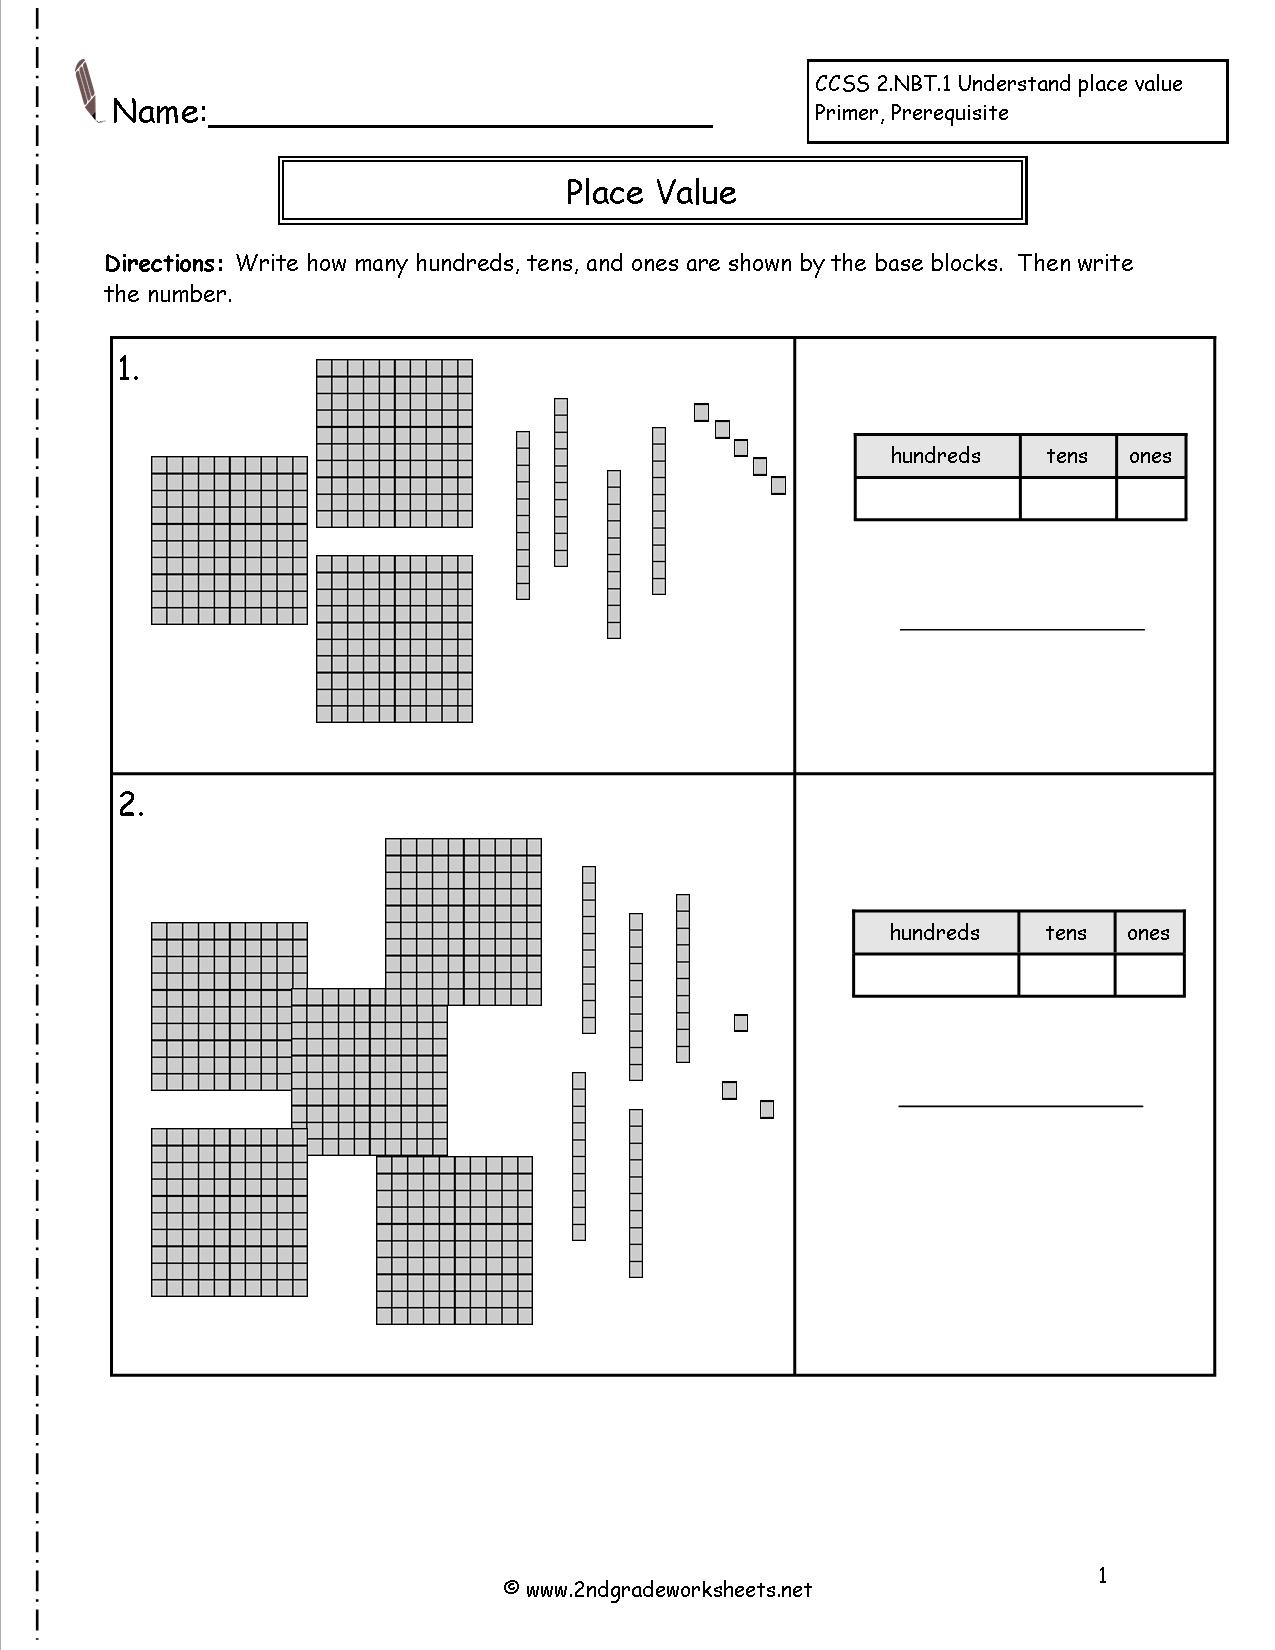 Second Grade Place Value Worksheets | Free Printable Base Ten Block Worksheets